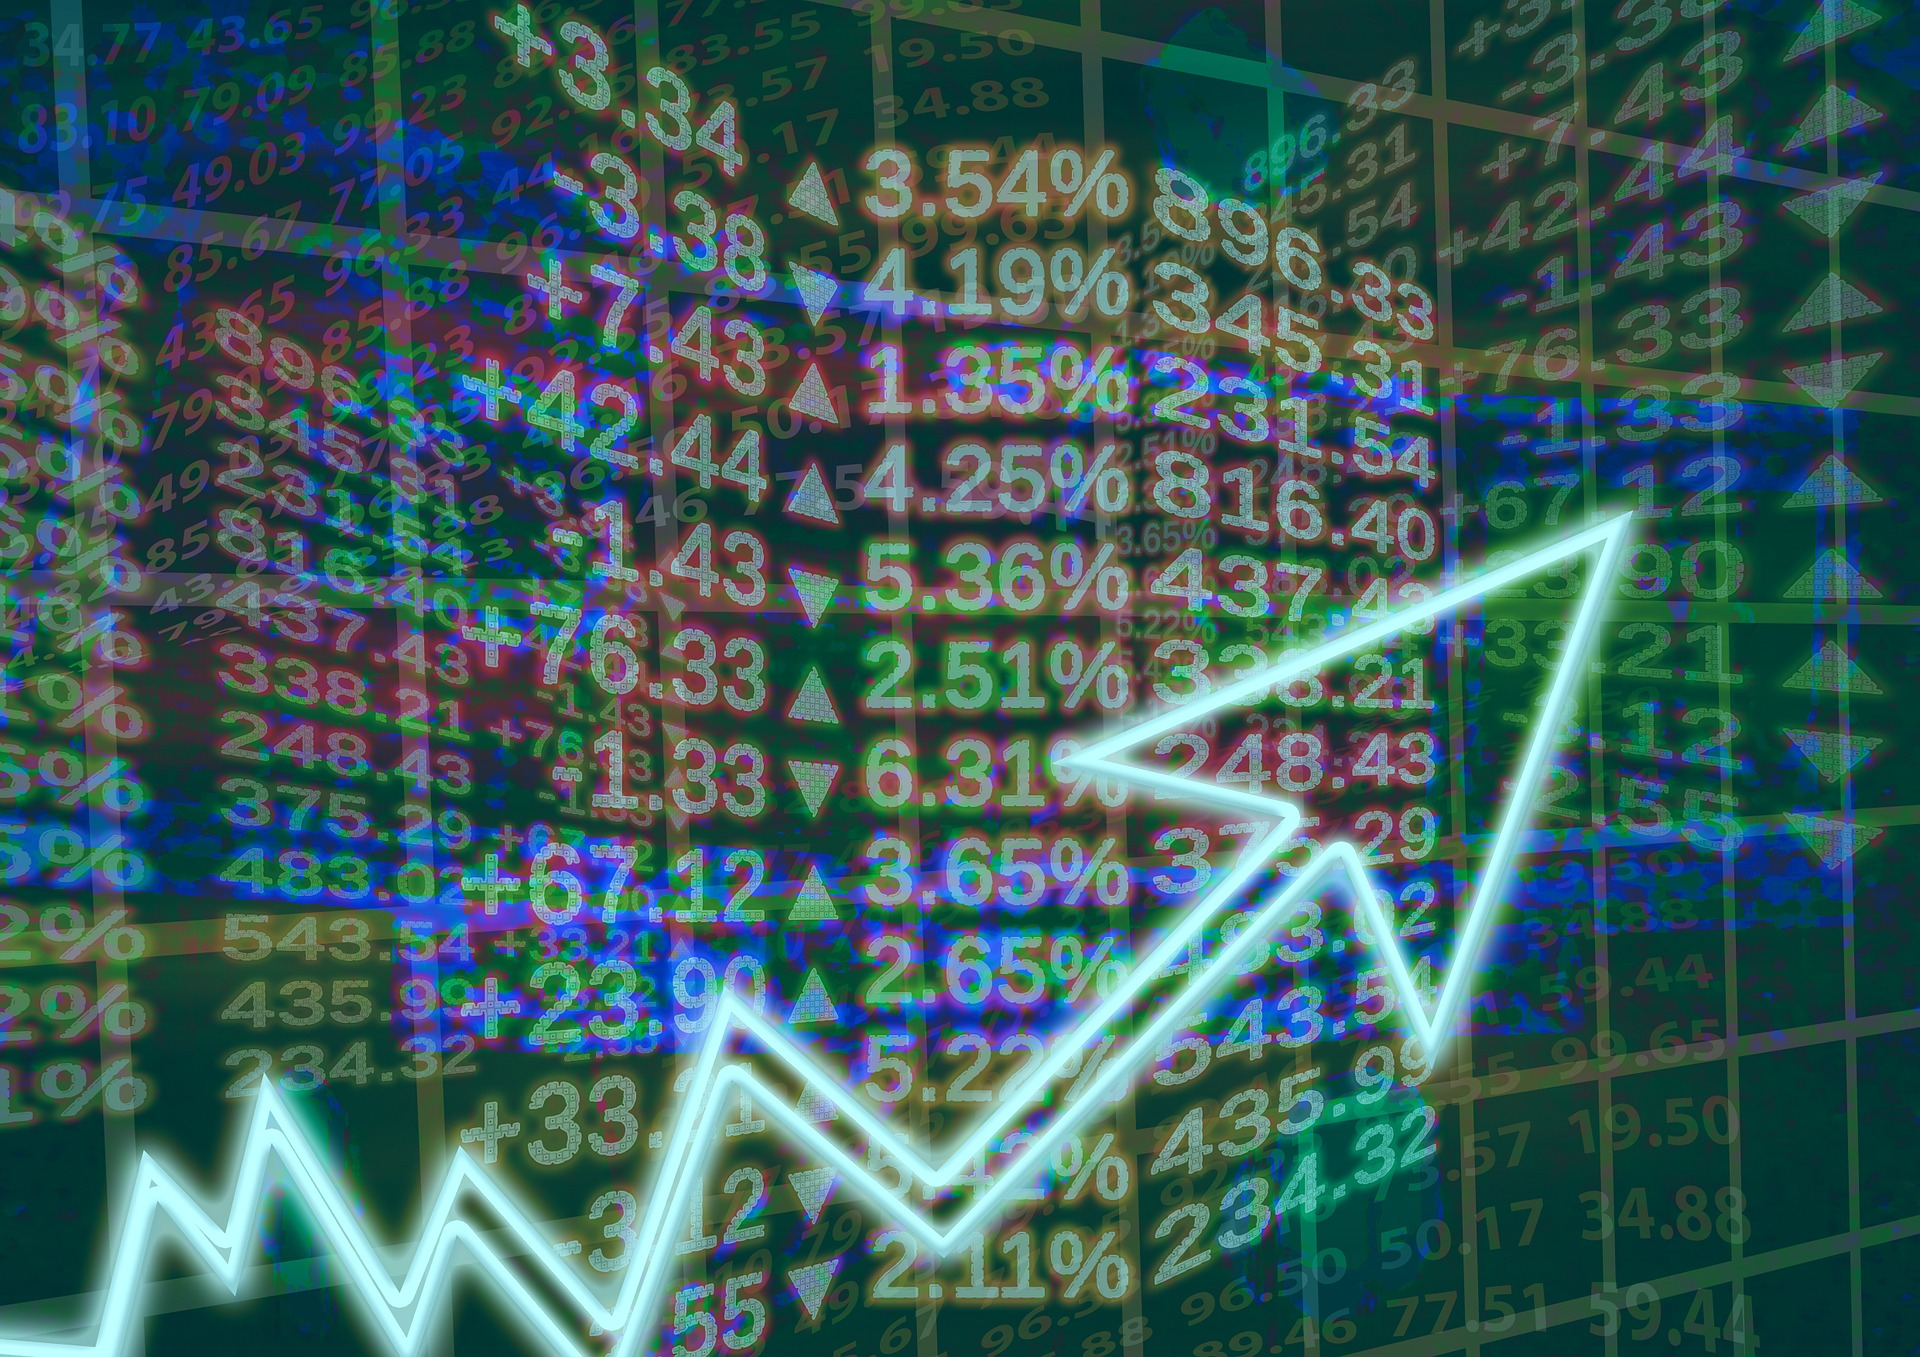 УниКредит Булбанк: Повишението на лихвите ще започне през 2020 година